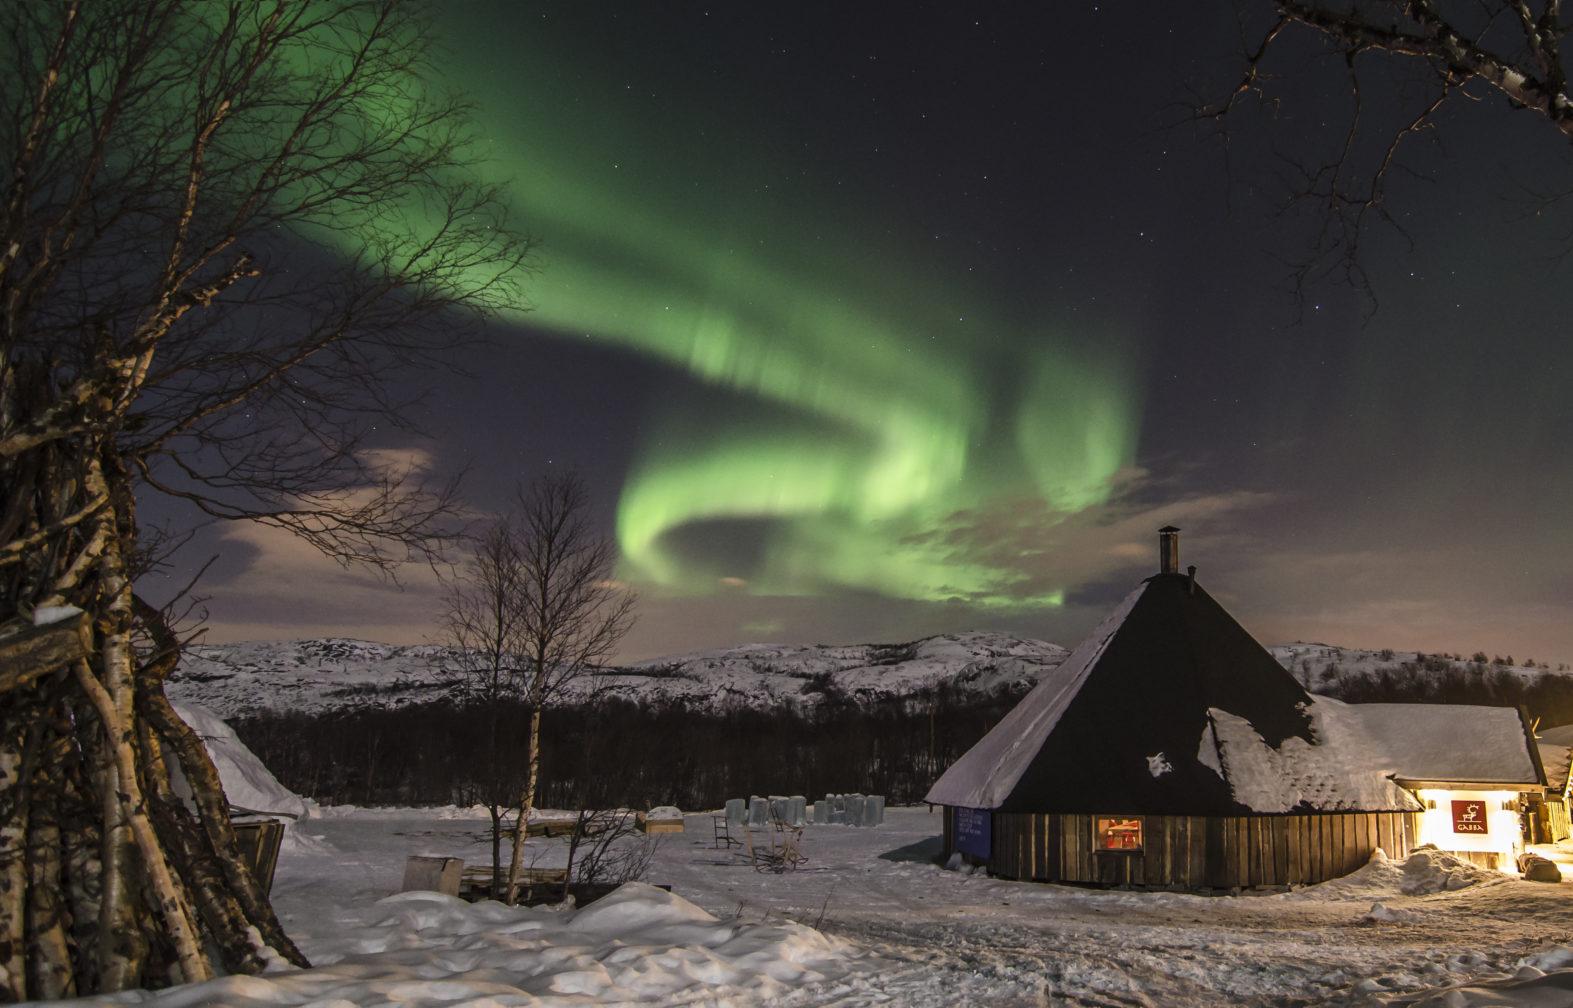 King Crab log cabin with Northern Lights overhead in Kirkenes, Norway.